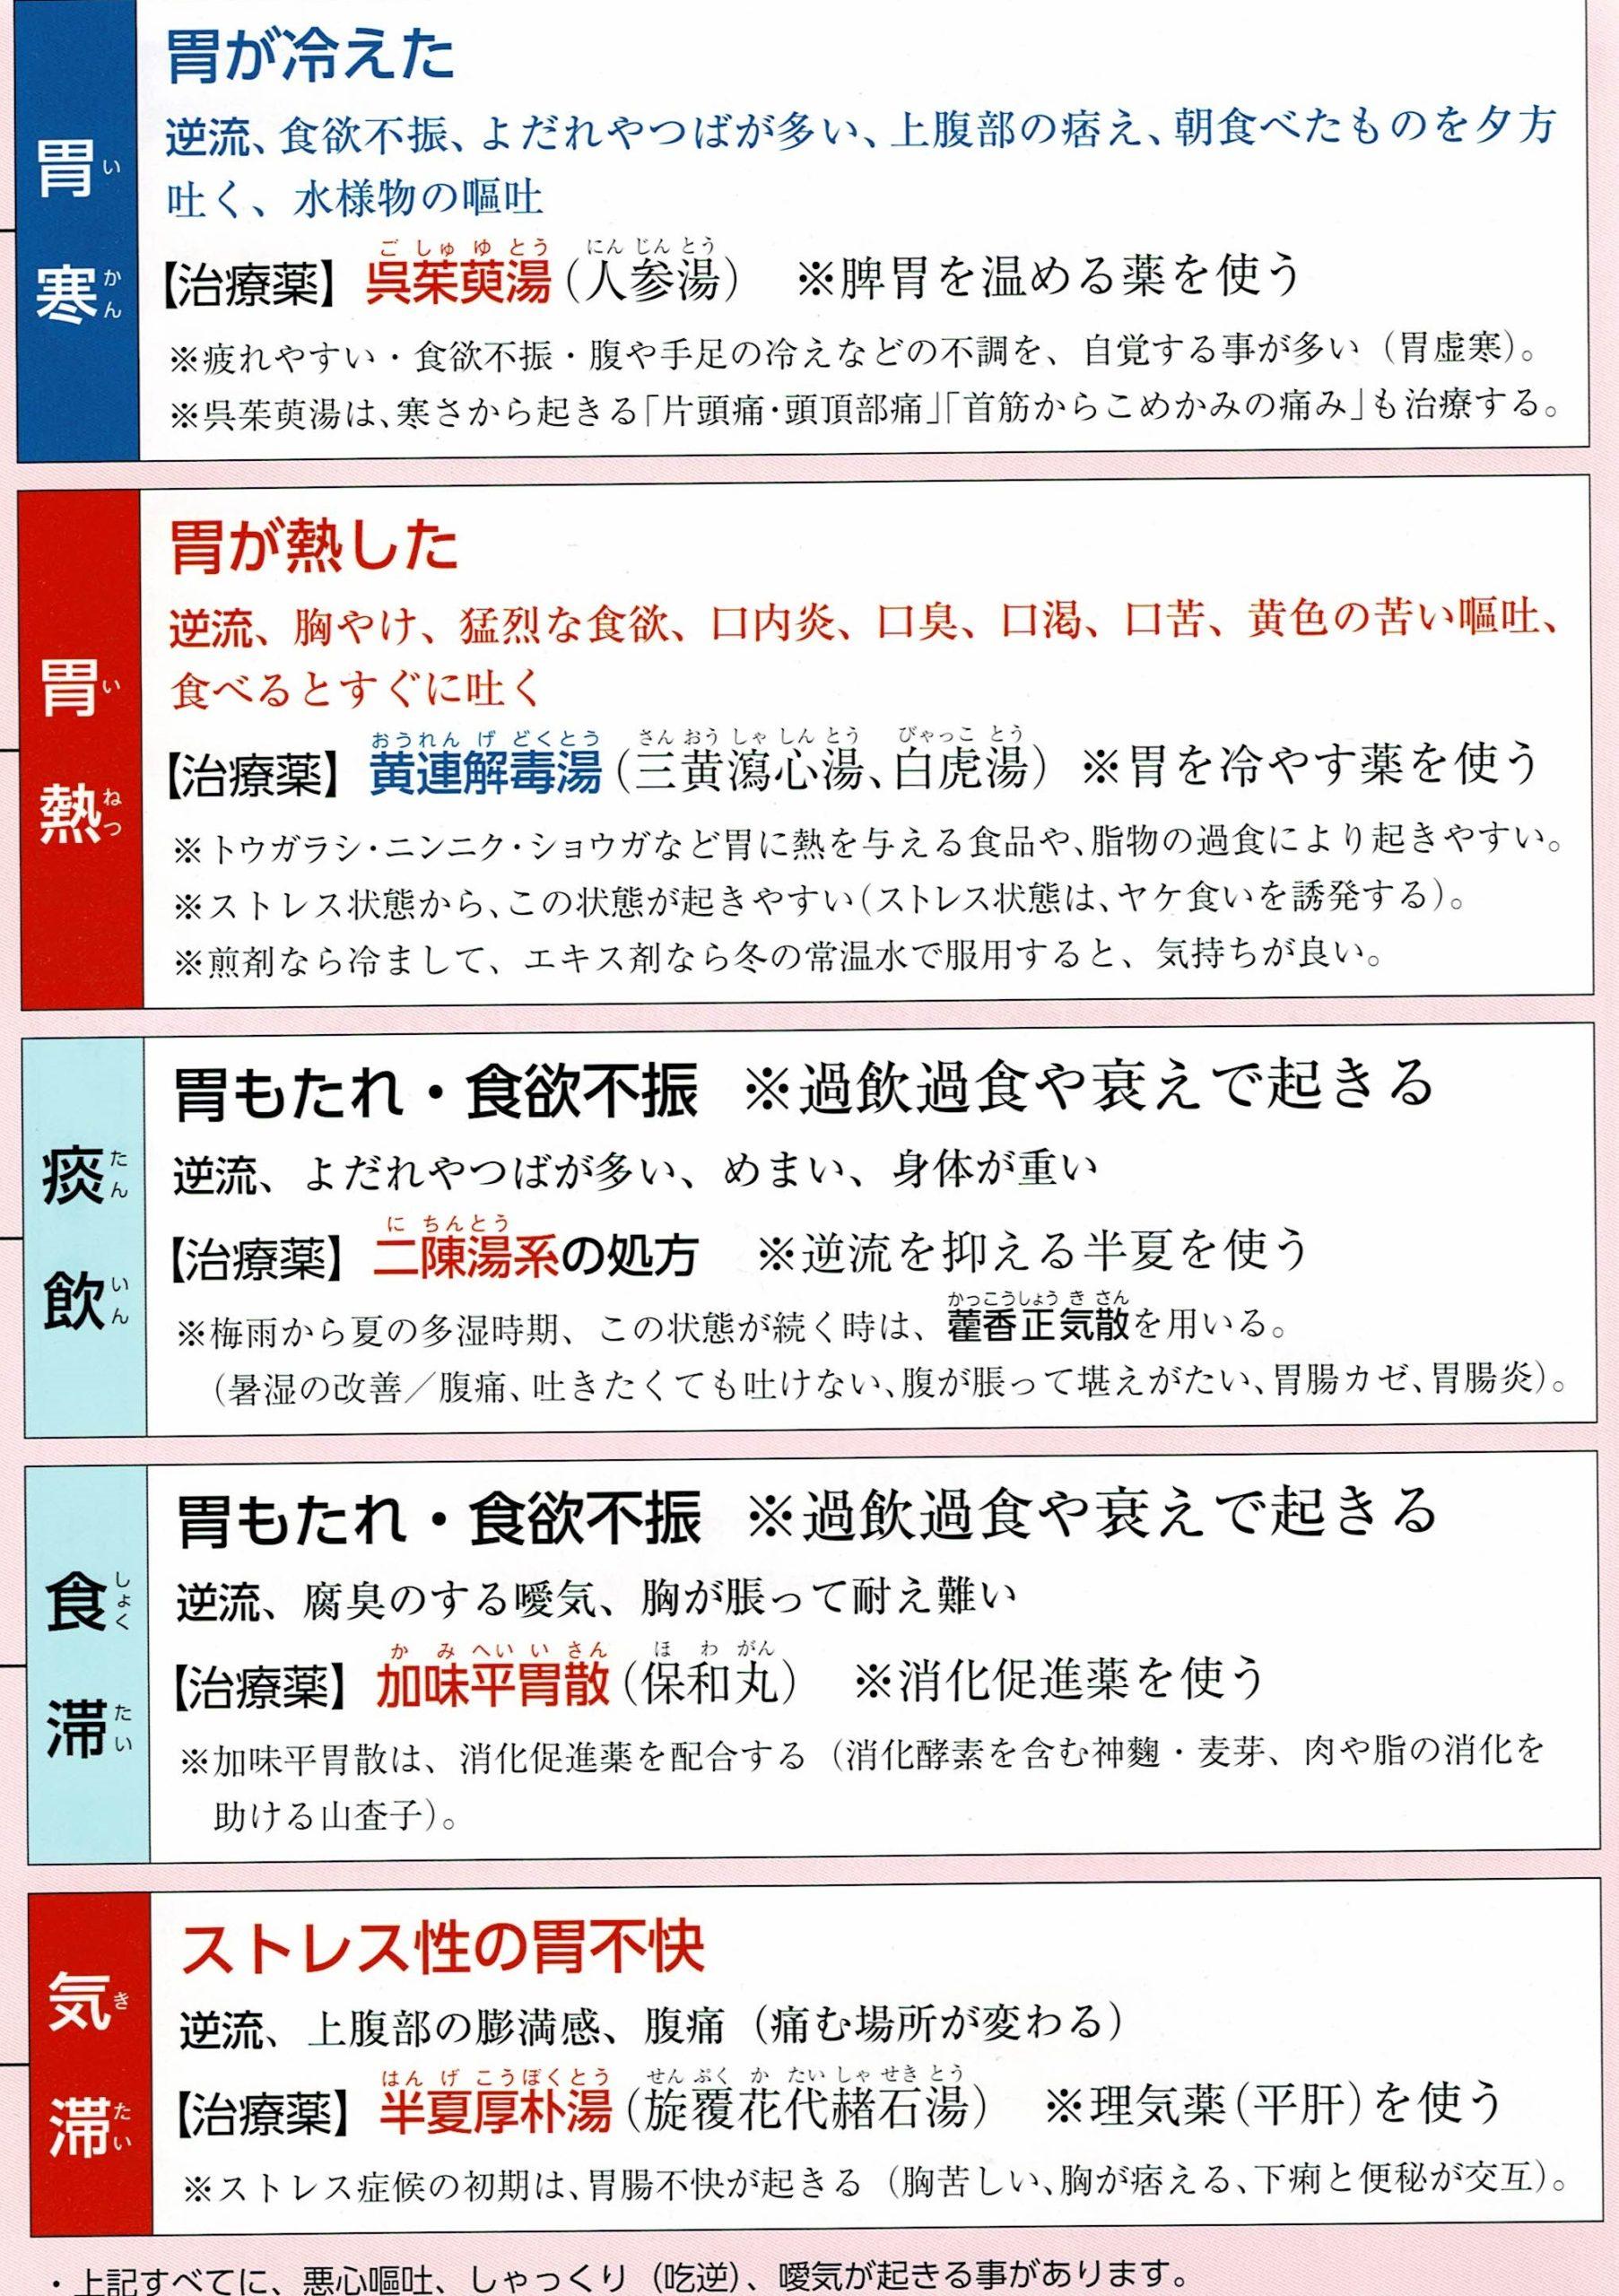 逆流性食道炎の漢方治療